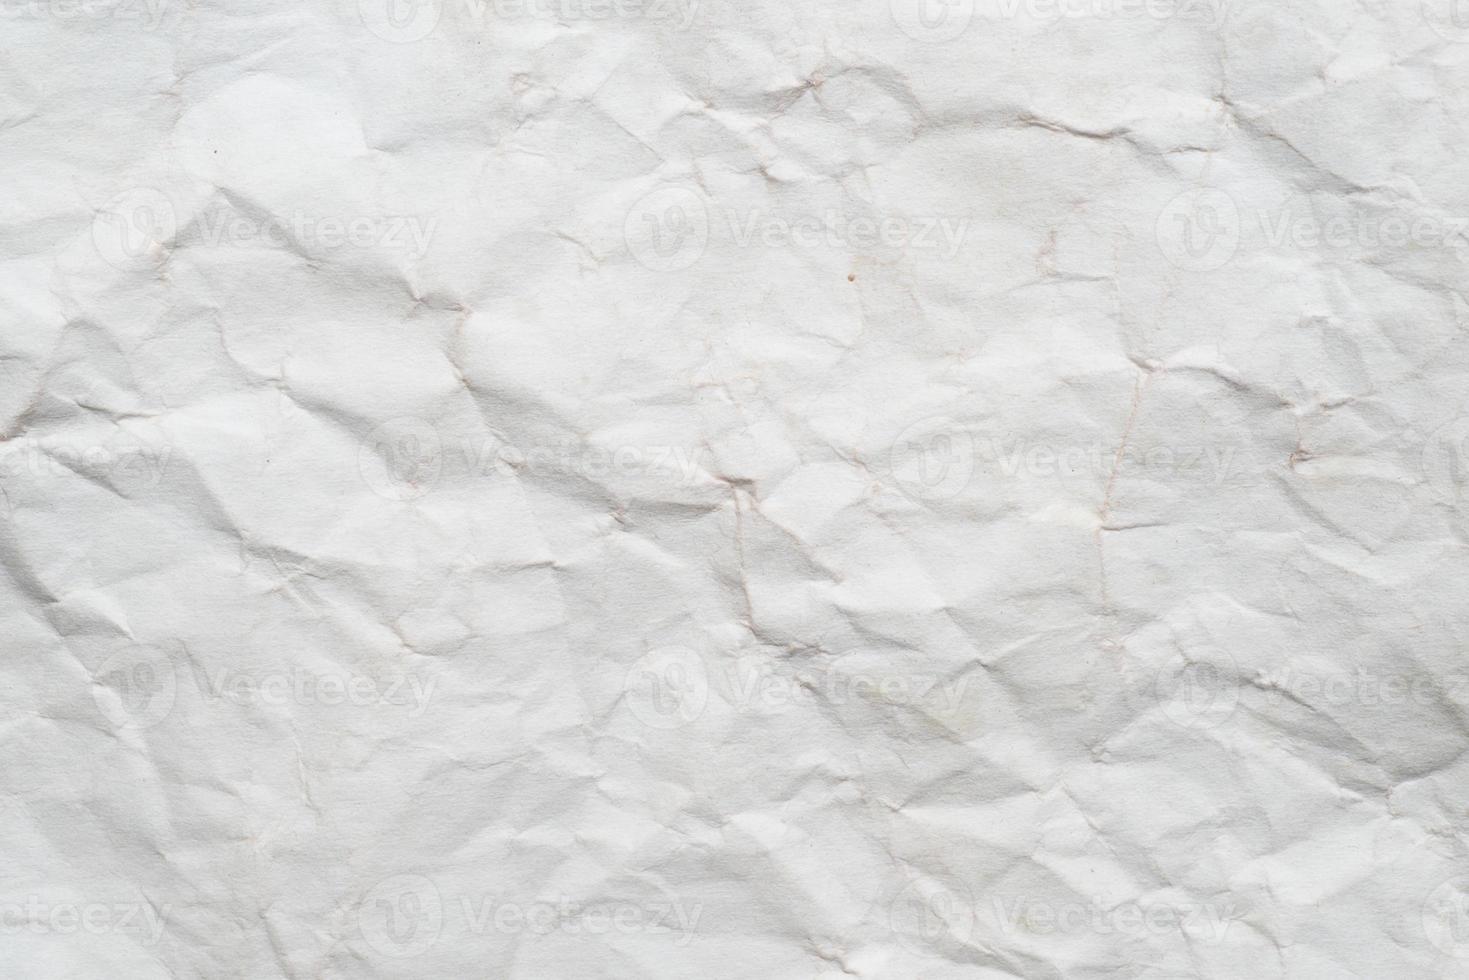 Textured crumpled paper photo